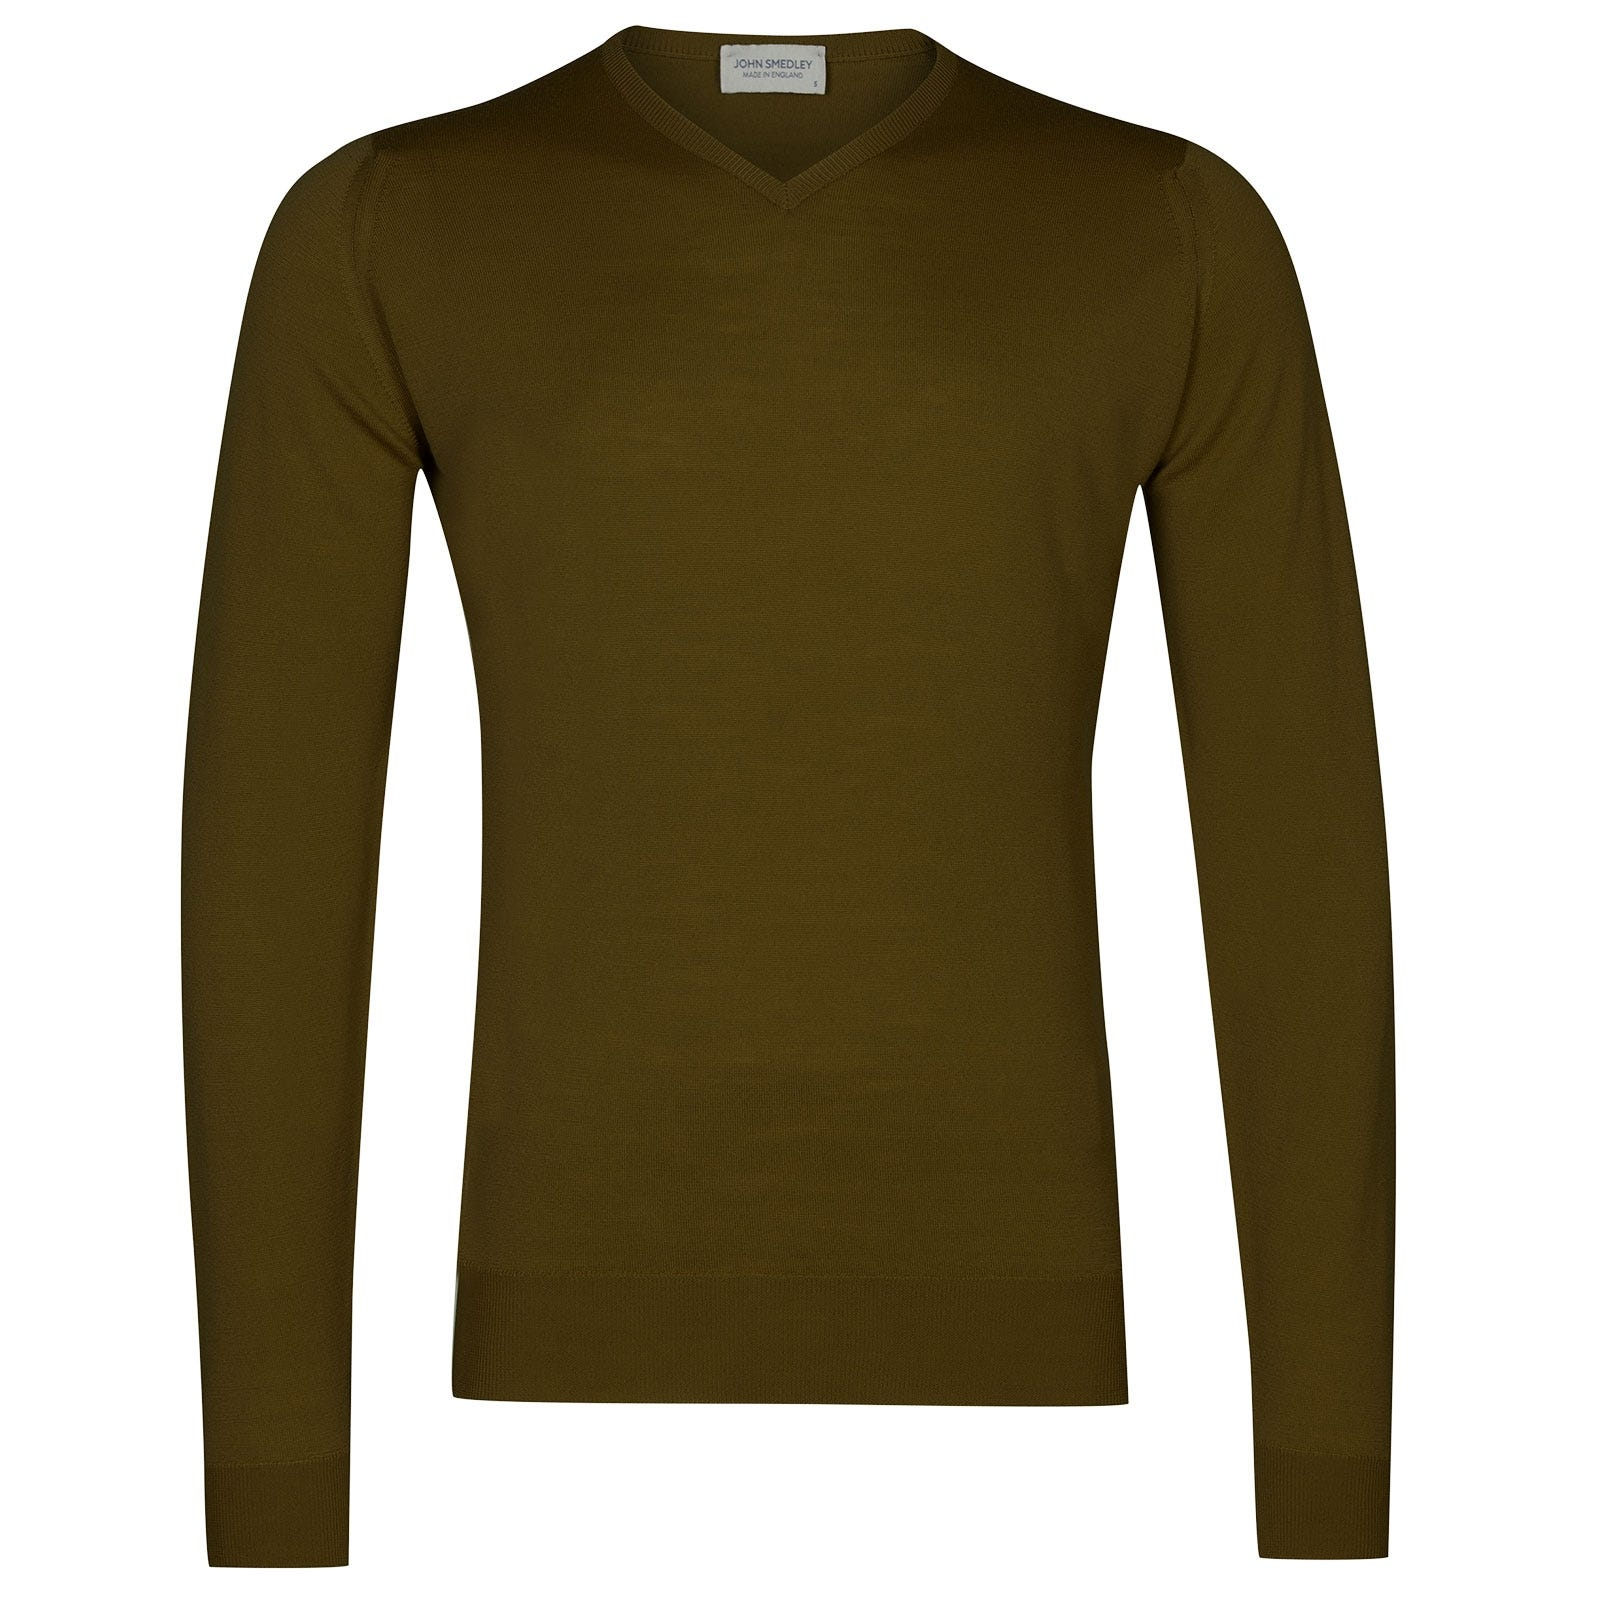 John Smedley Shipton Merino Wool Pullover in Khaki-L